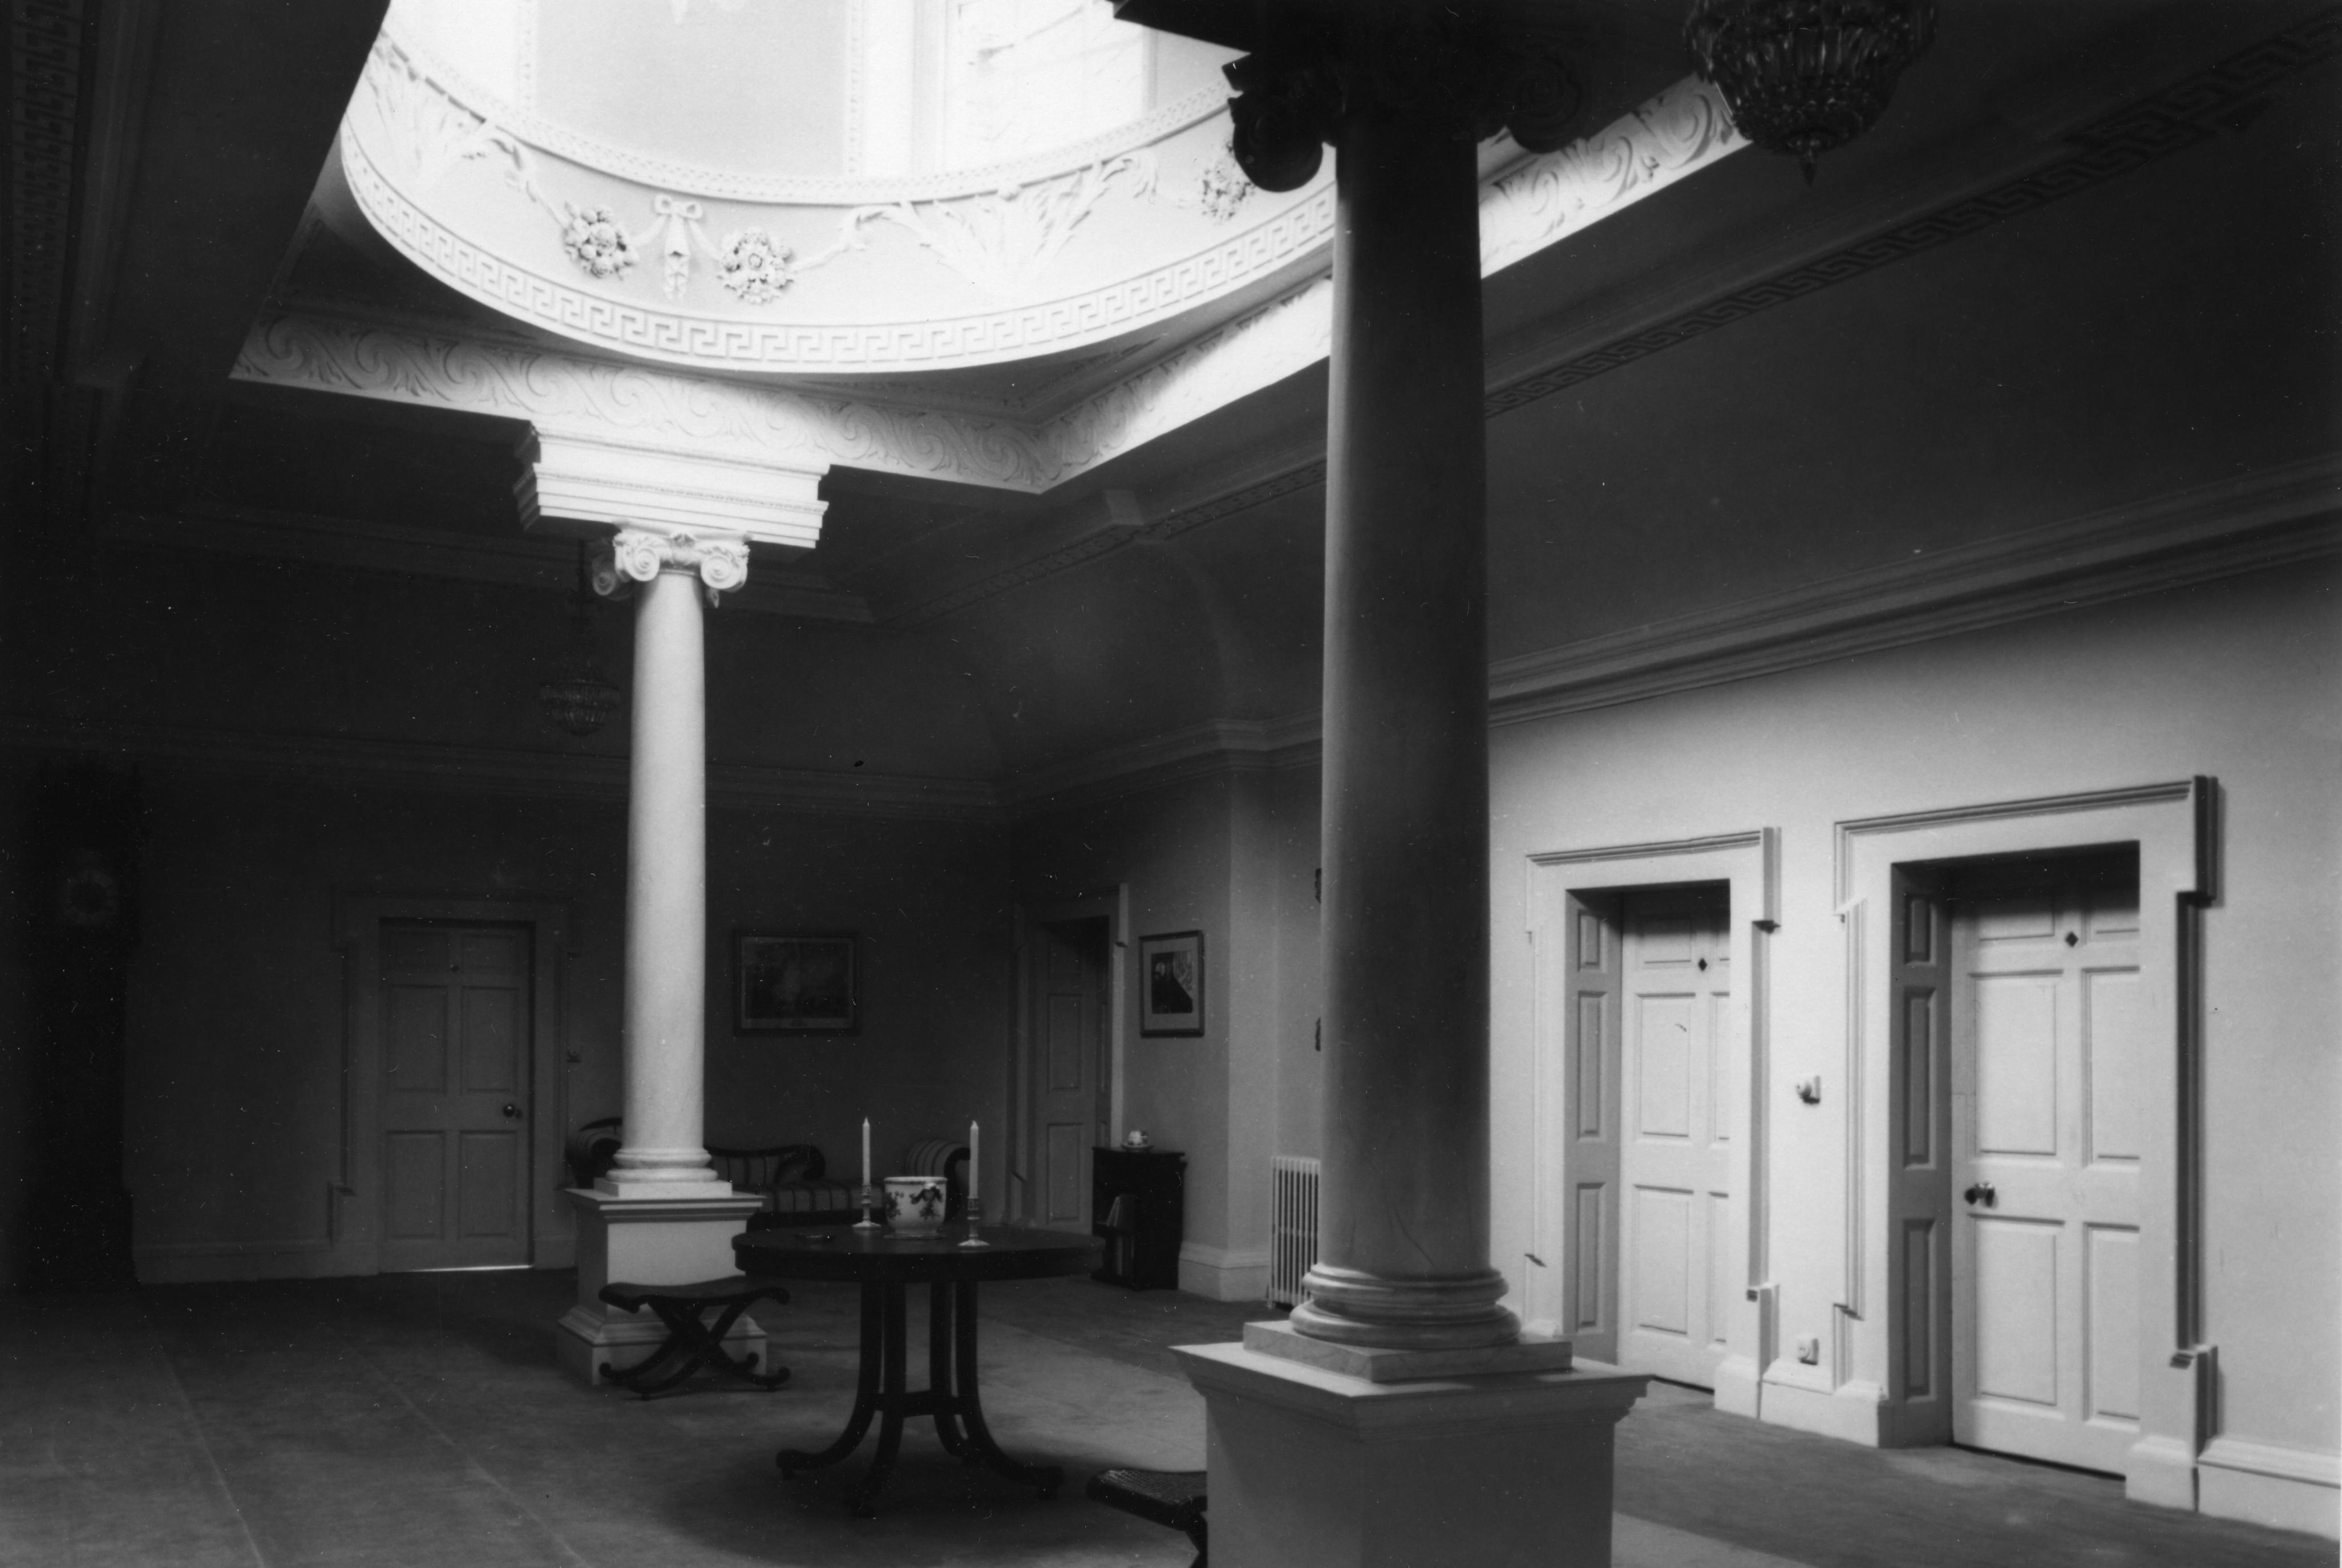 Russborough-lobby.jpg#asset:13614